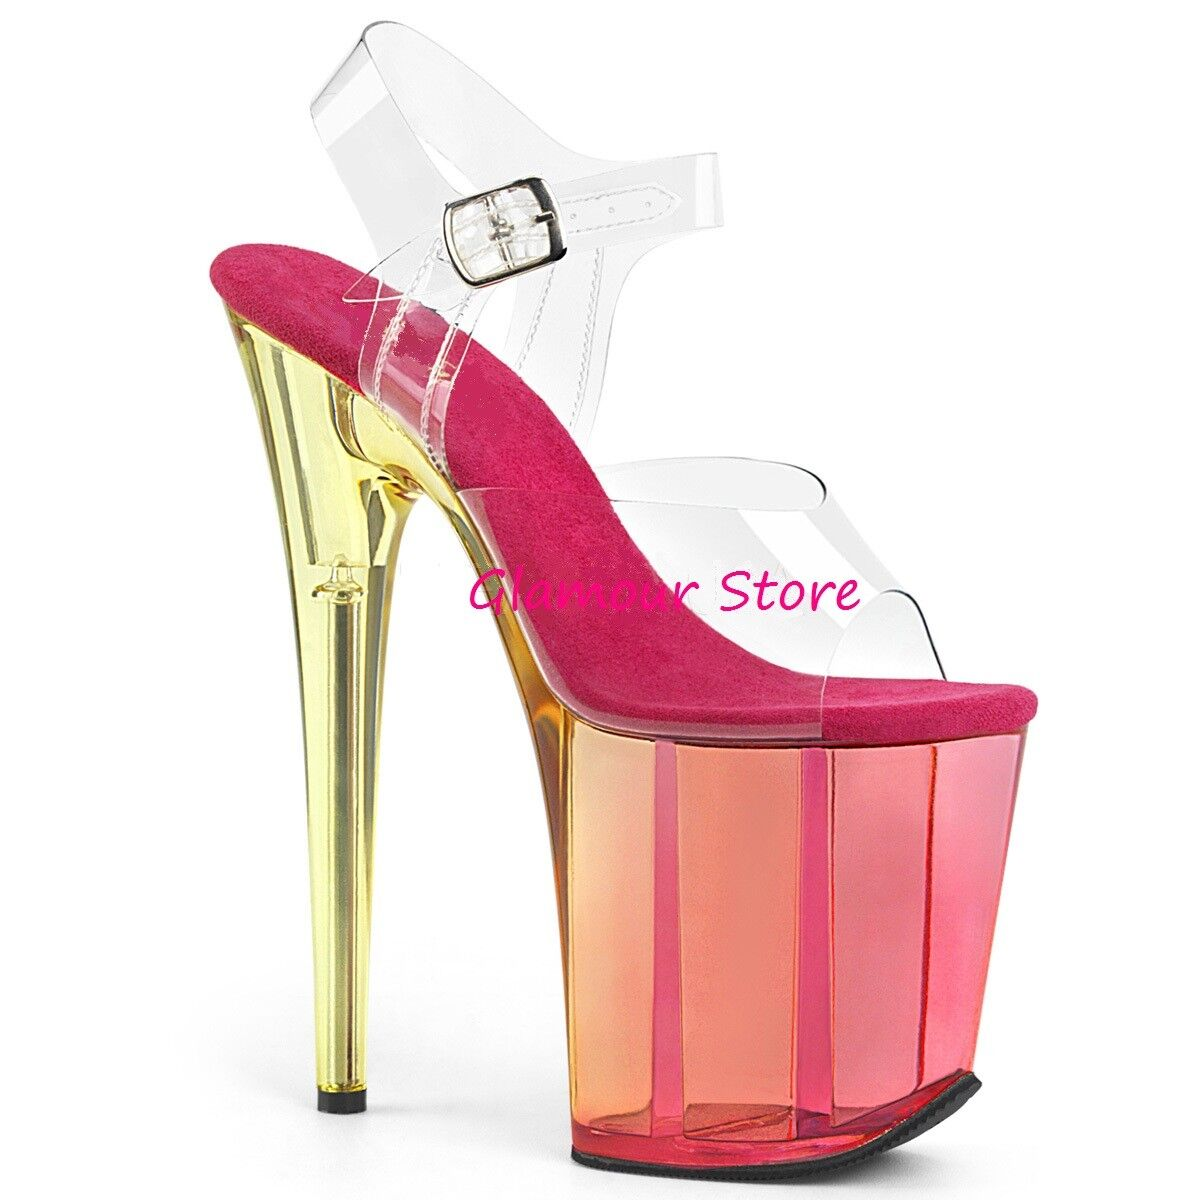 Sexy SANDALI tacco 20 rosado TRASPARENTE dal 35 al al al 40 plateau zapatos glamour CLUB  hasta un 50% de descuento